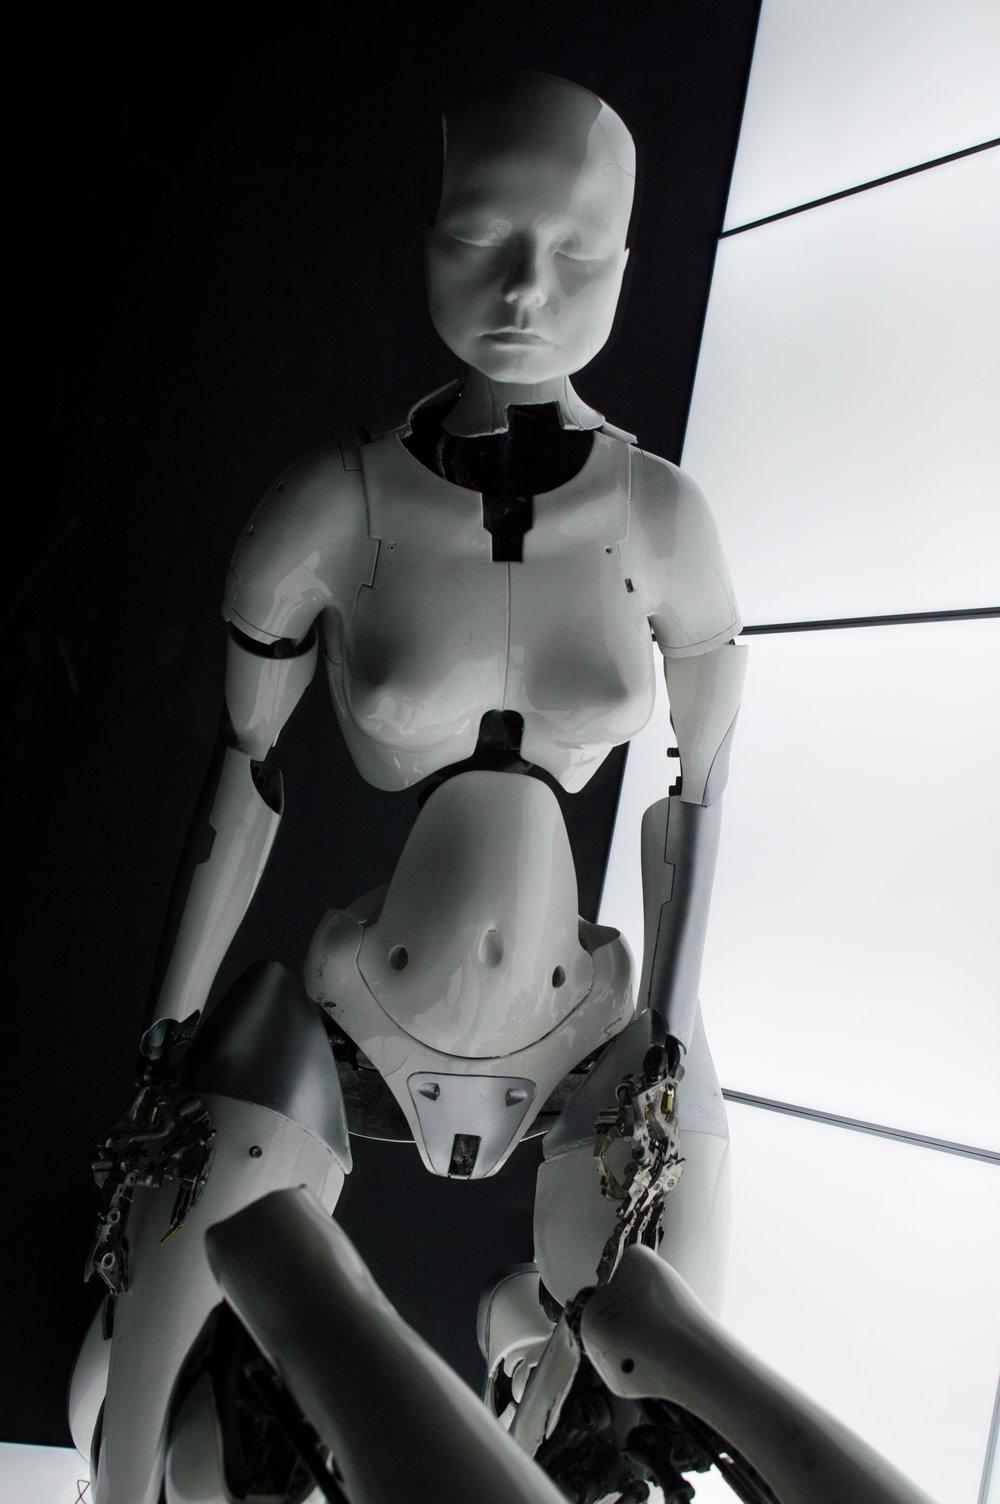 Bjork Gallery Opening at MoMA